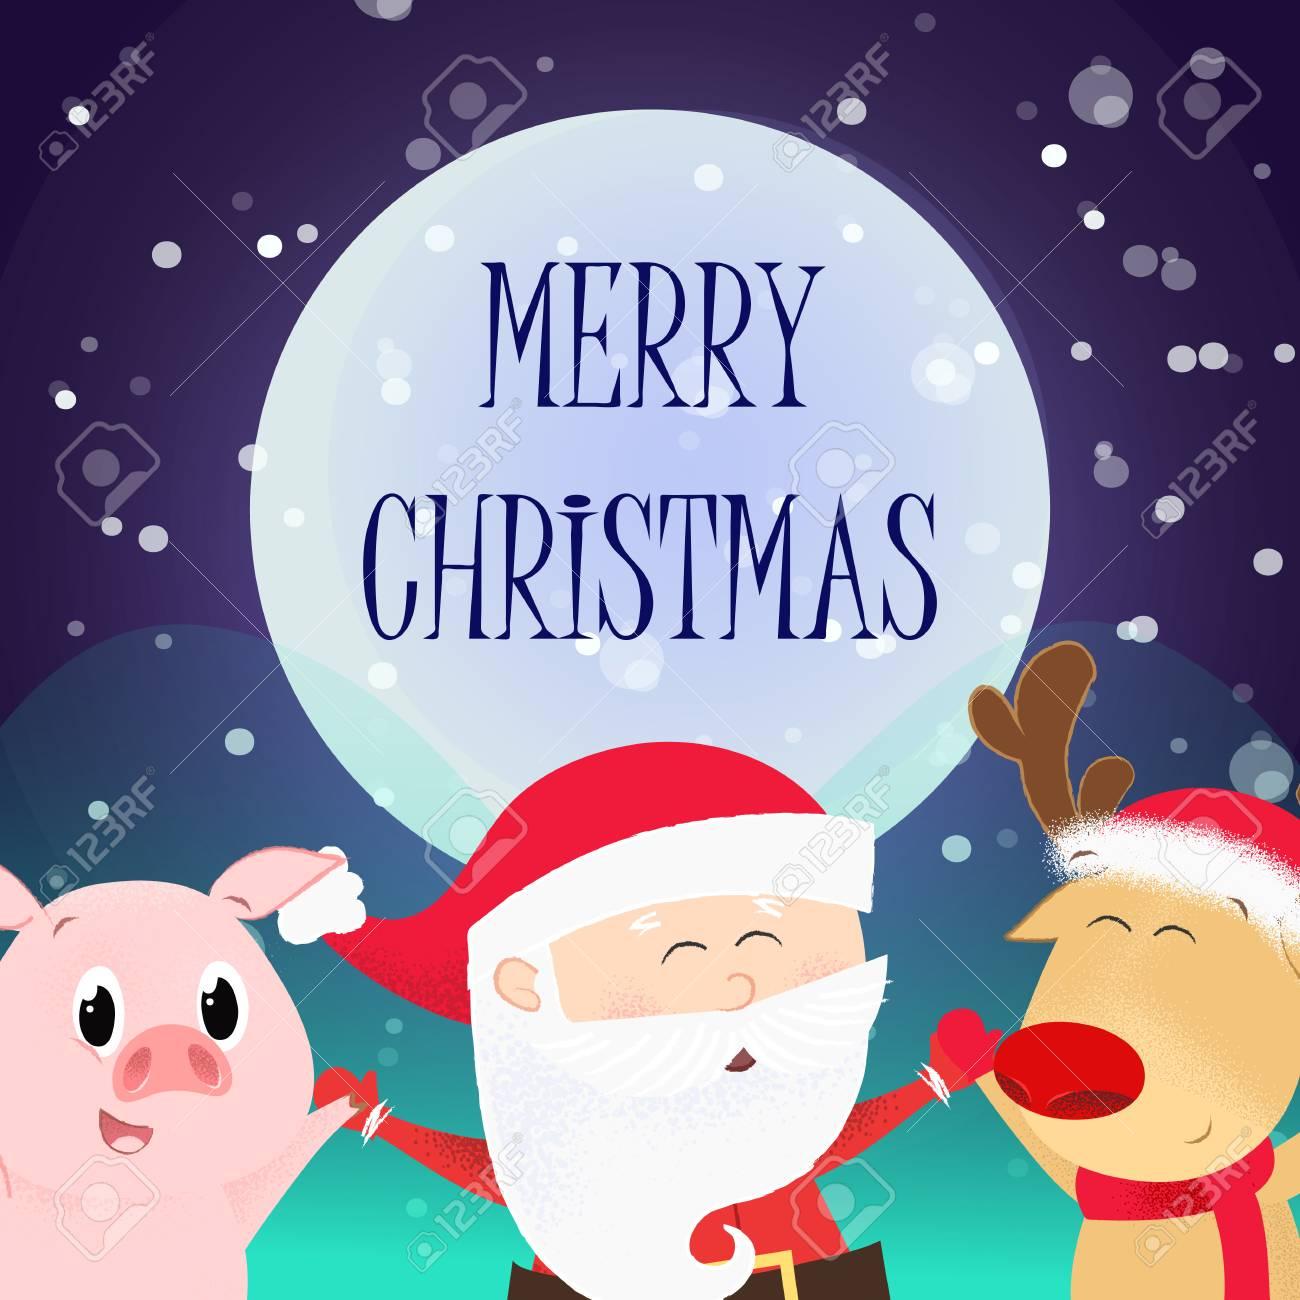 Christmas Flyer.Merry Christmas Flyer Design Dancing Cute Santa Claus Reindeer